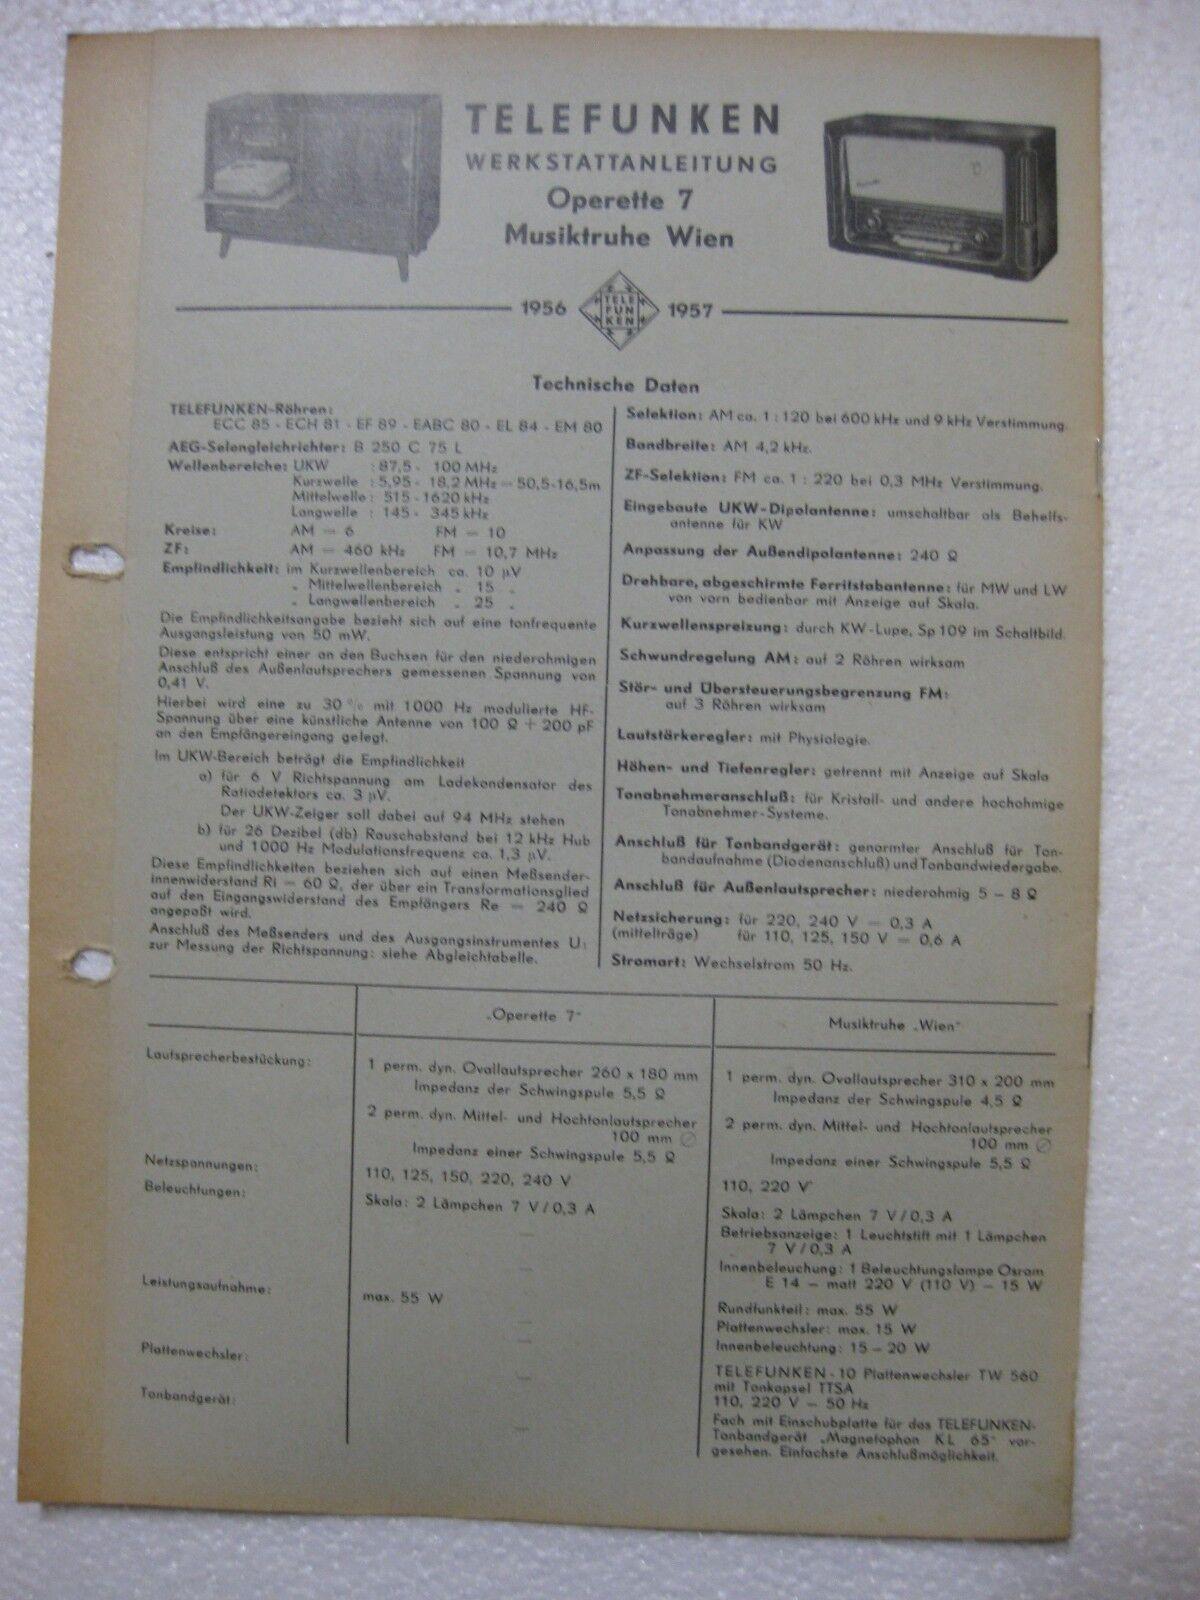 TELEFUNKEN Operette 7 Musiktruhe Wien Werkstattanl. /Schaltplan Original 1956-57